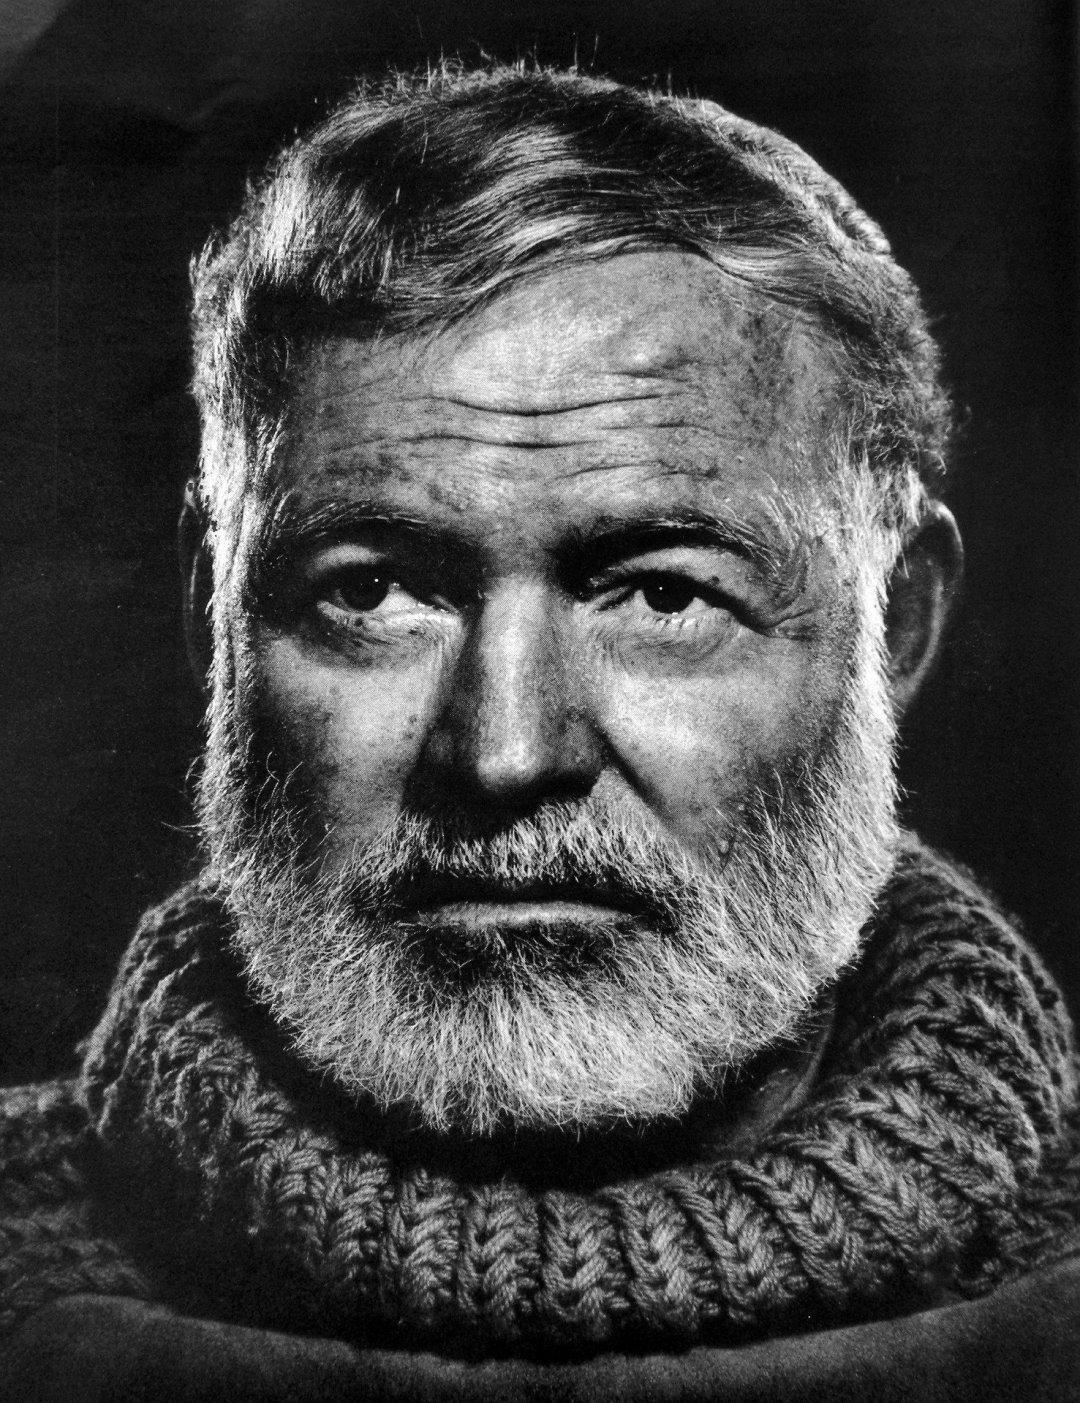 Ernest Hemingway Writings Ernest Hemingway   Ernest Hemingway Writings